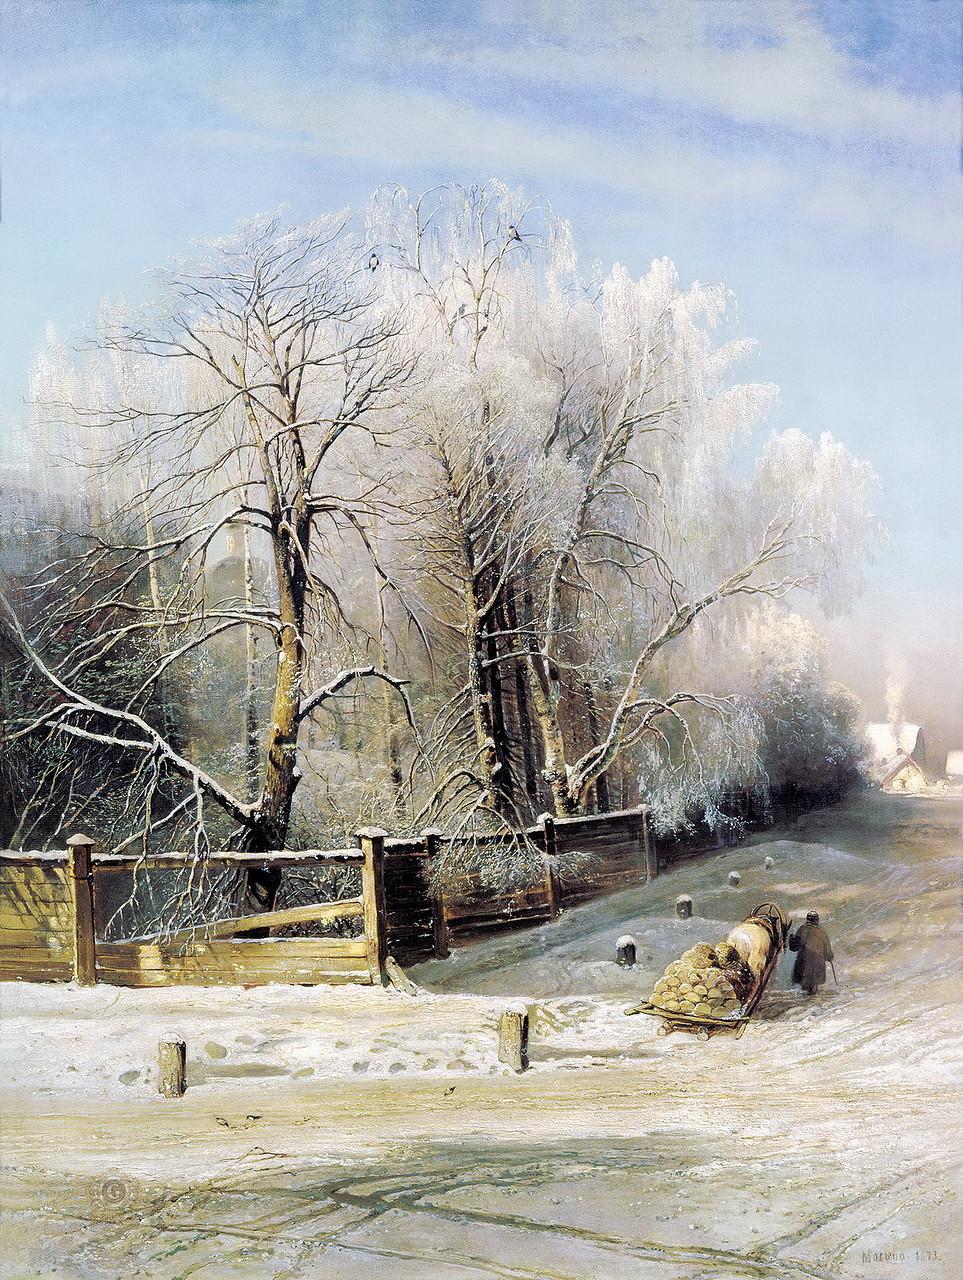 САВРАСОВ Алексей - Зимний пейзаж.jpg